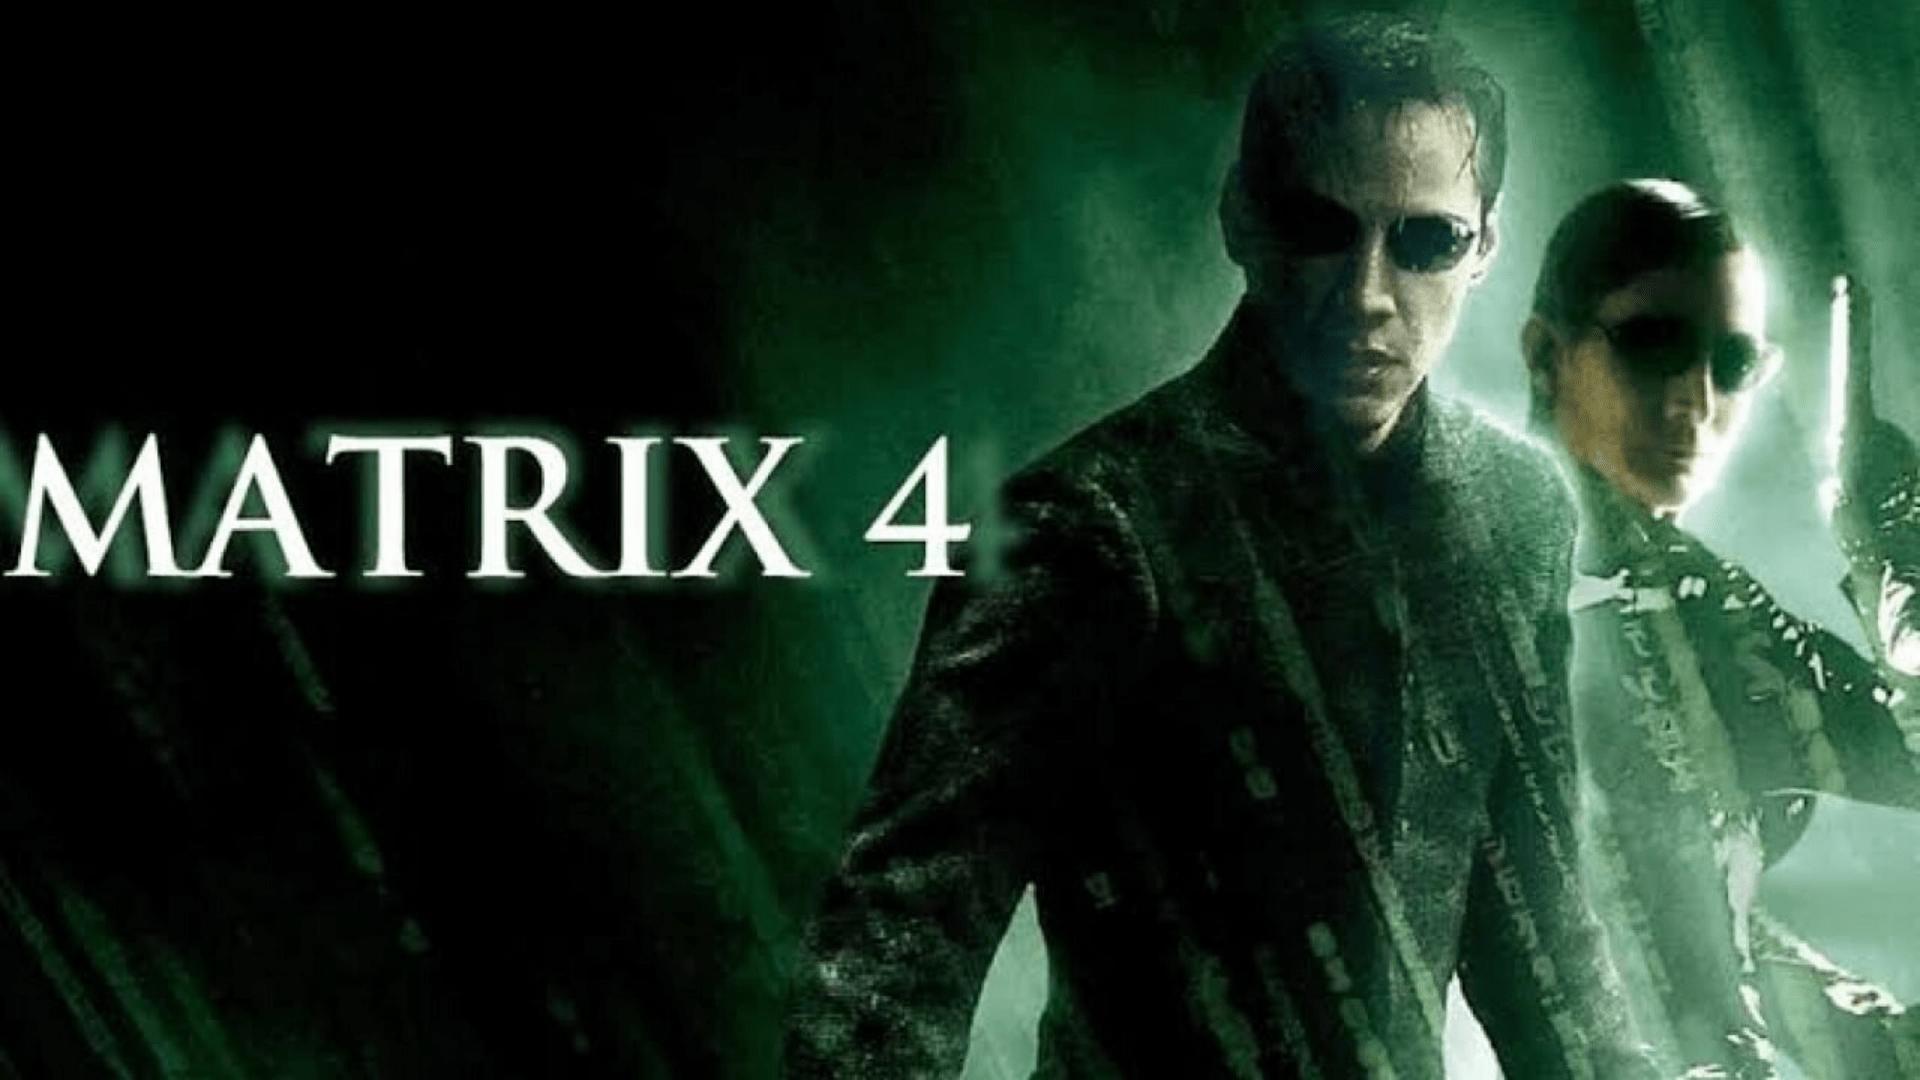 The Matrix 4 HD Wallpapers | 7wallpapers.net